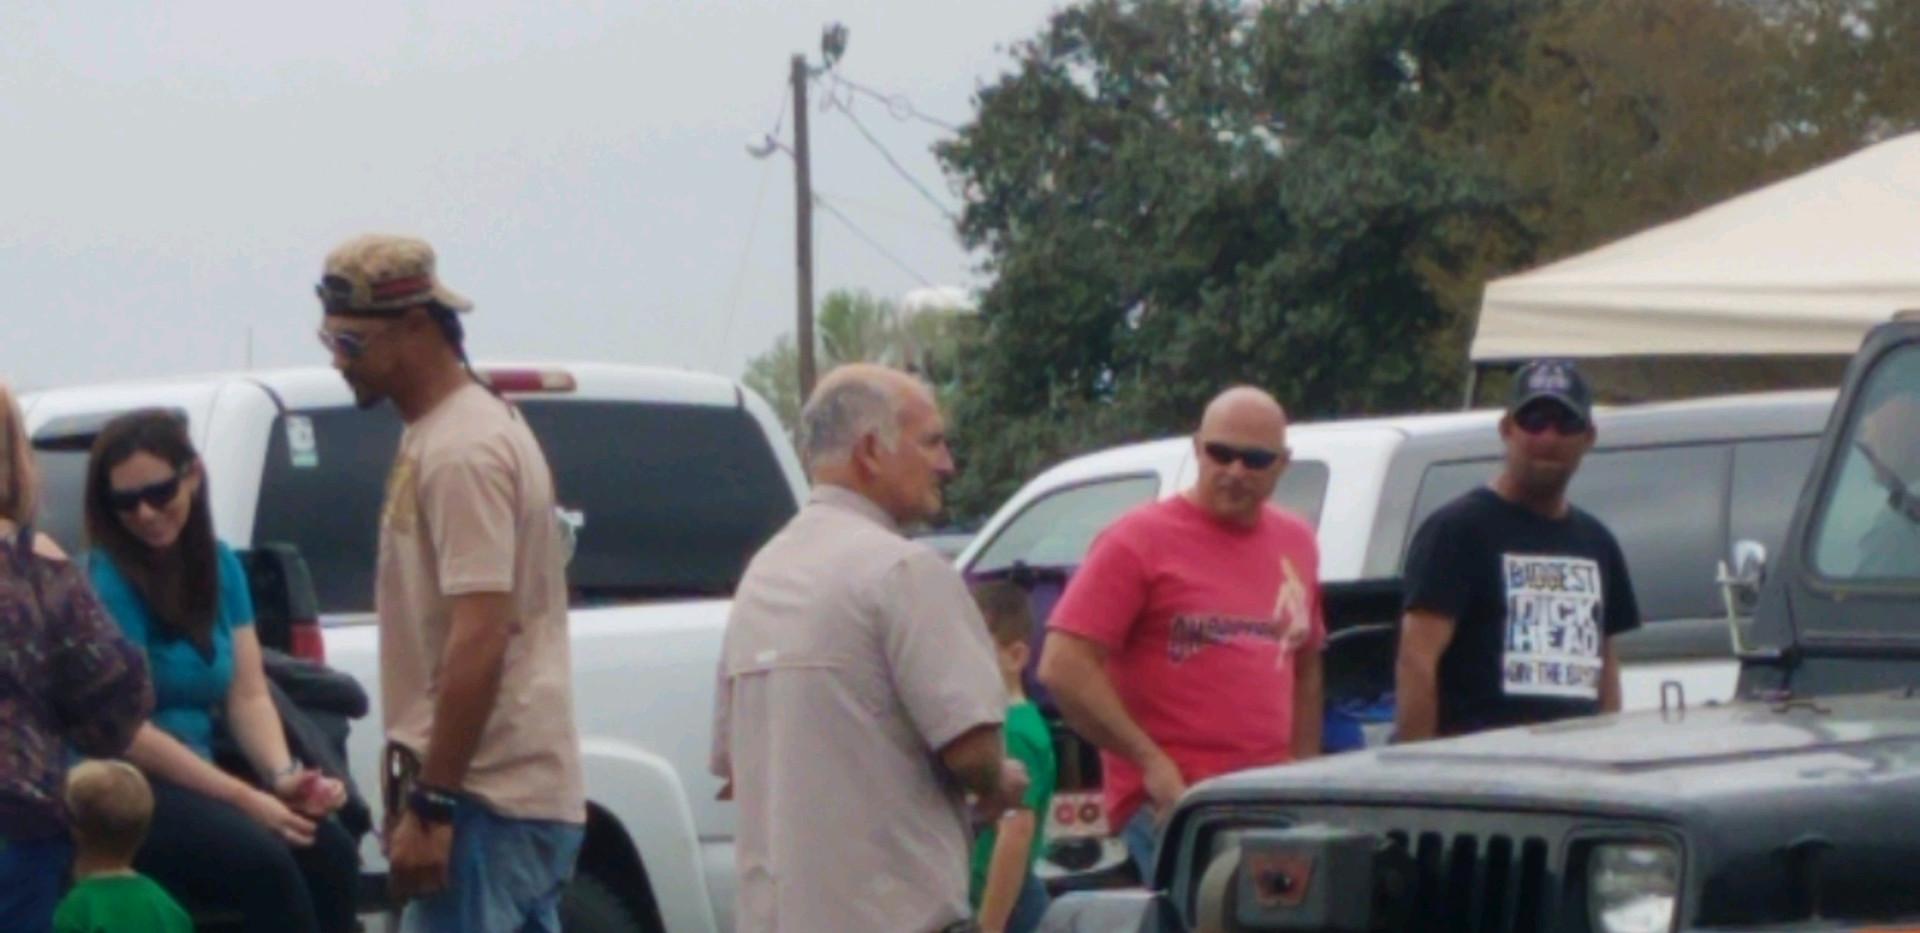 02. Jimmy LeBlanc evangelizing at the Lo